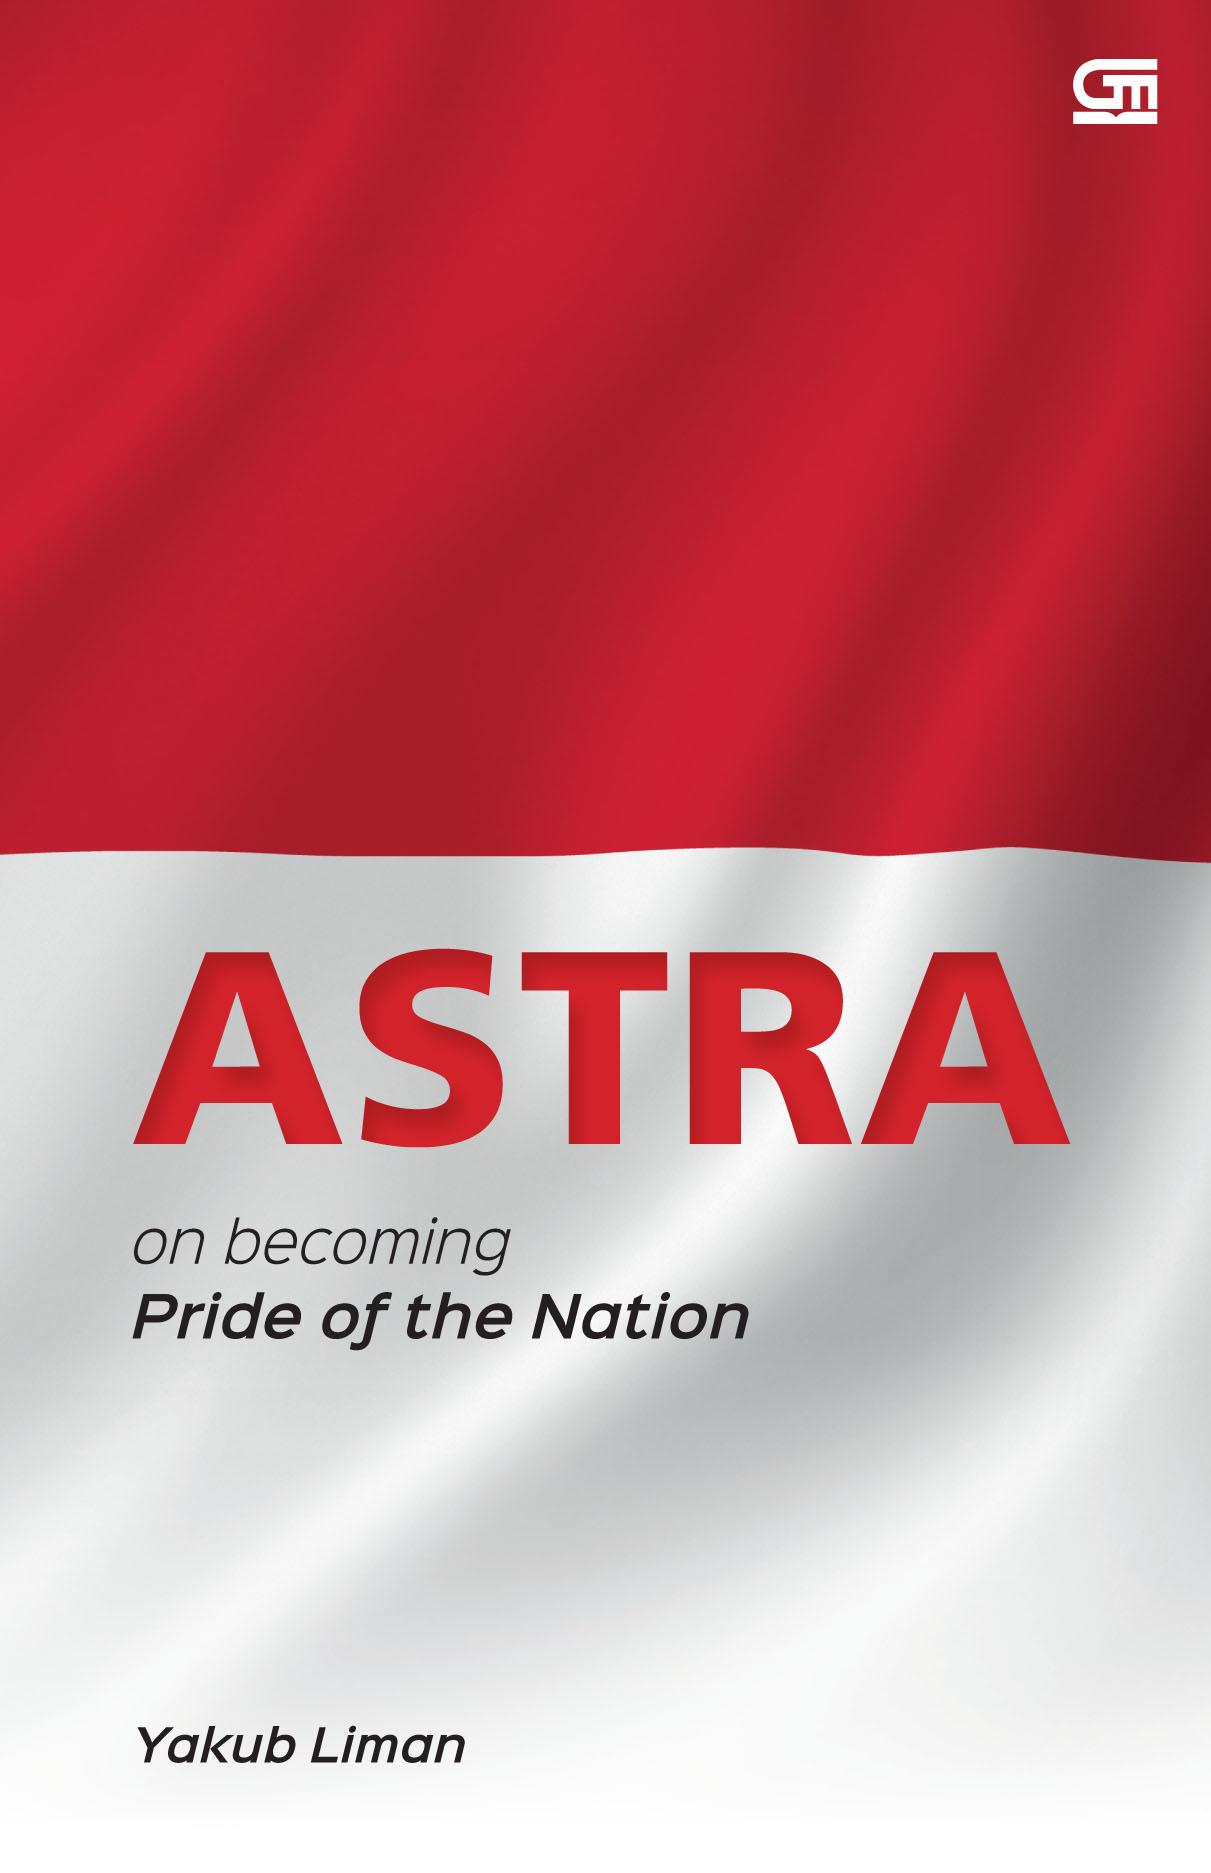 ASTRA, on becoming pride of nation (Ed. Bahasa Inggris)